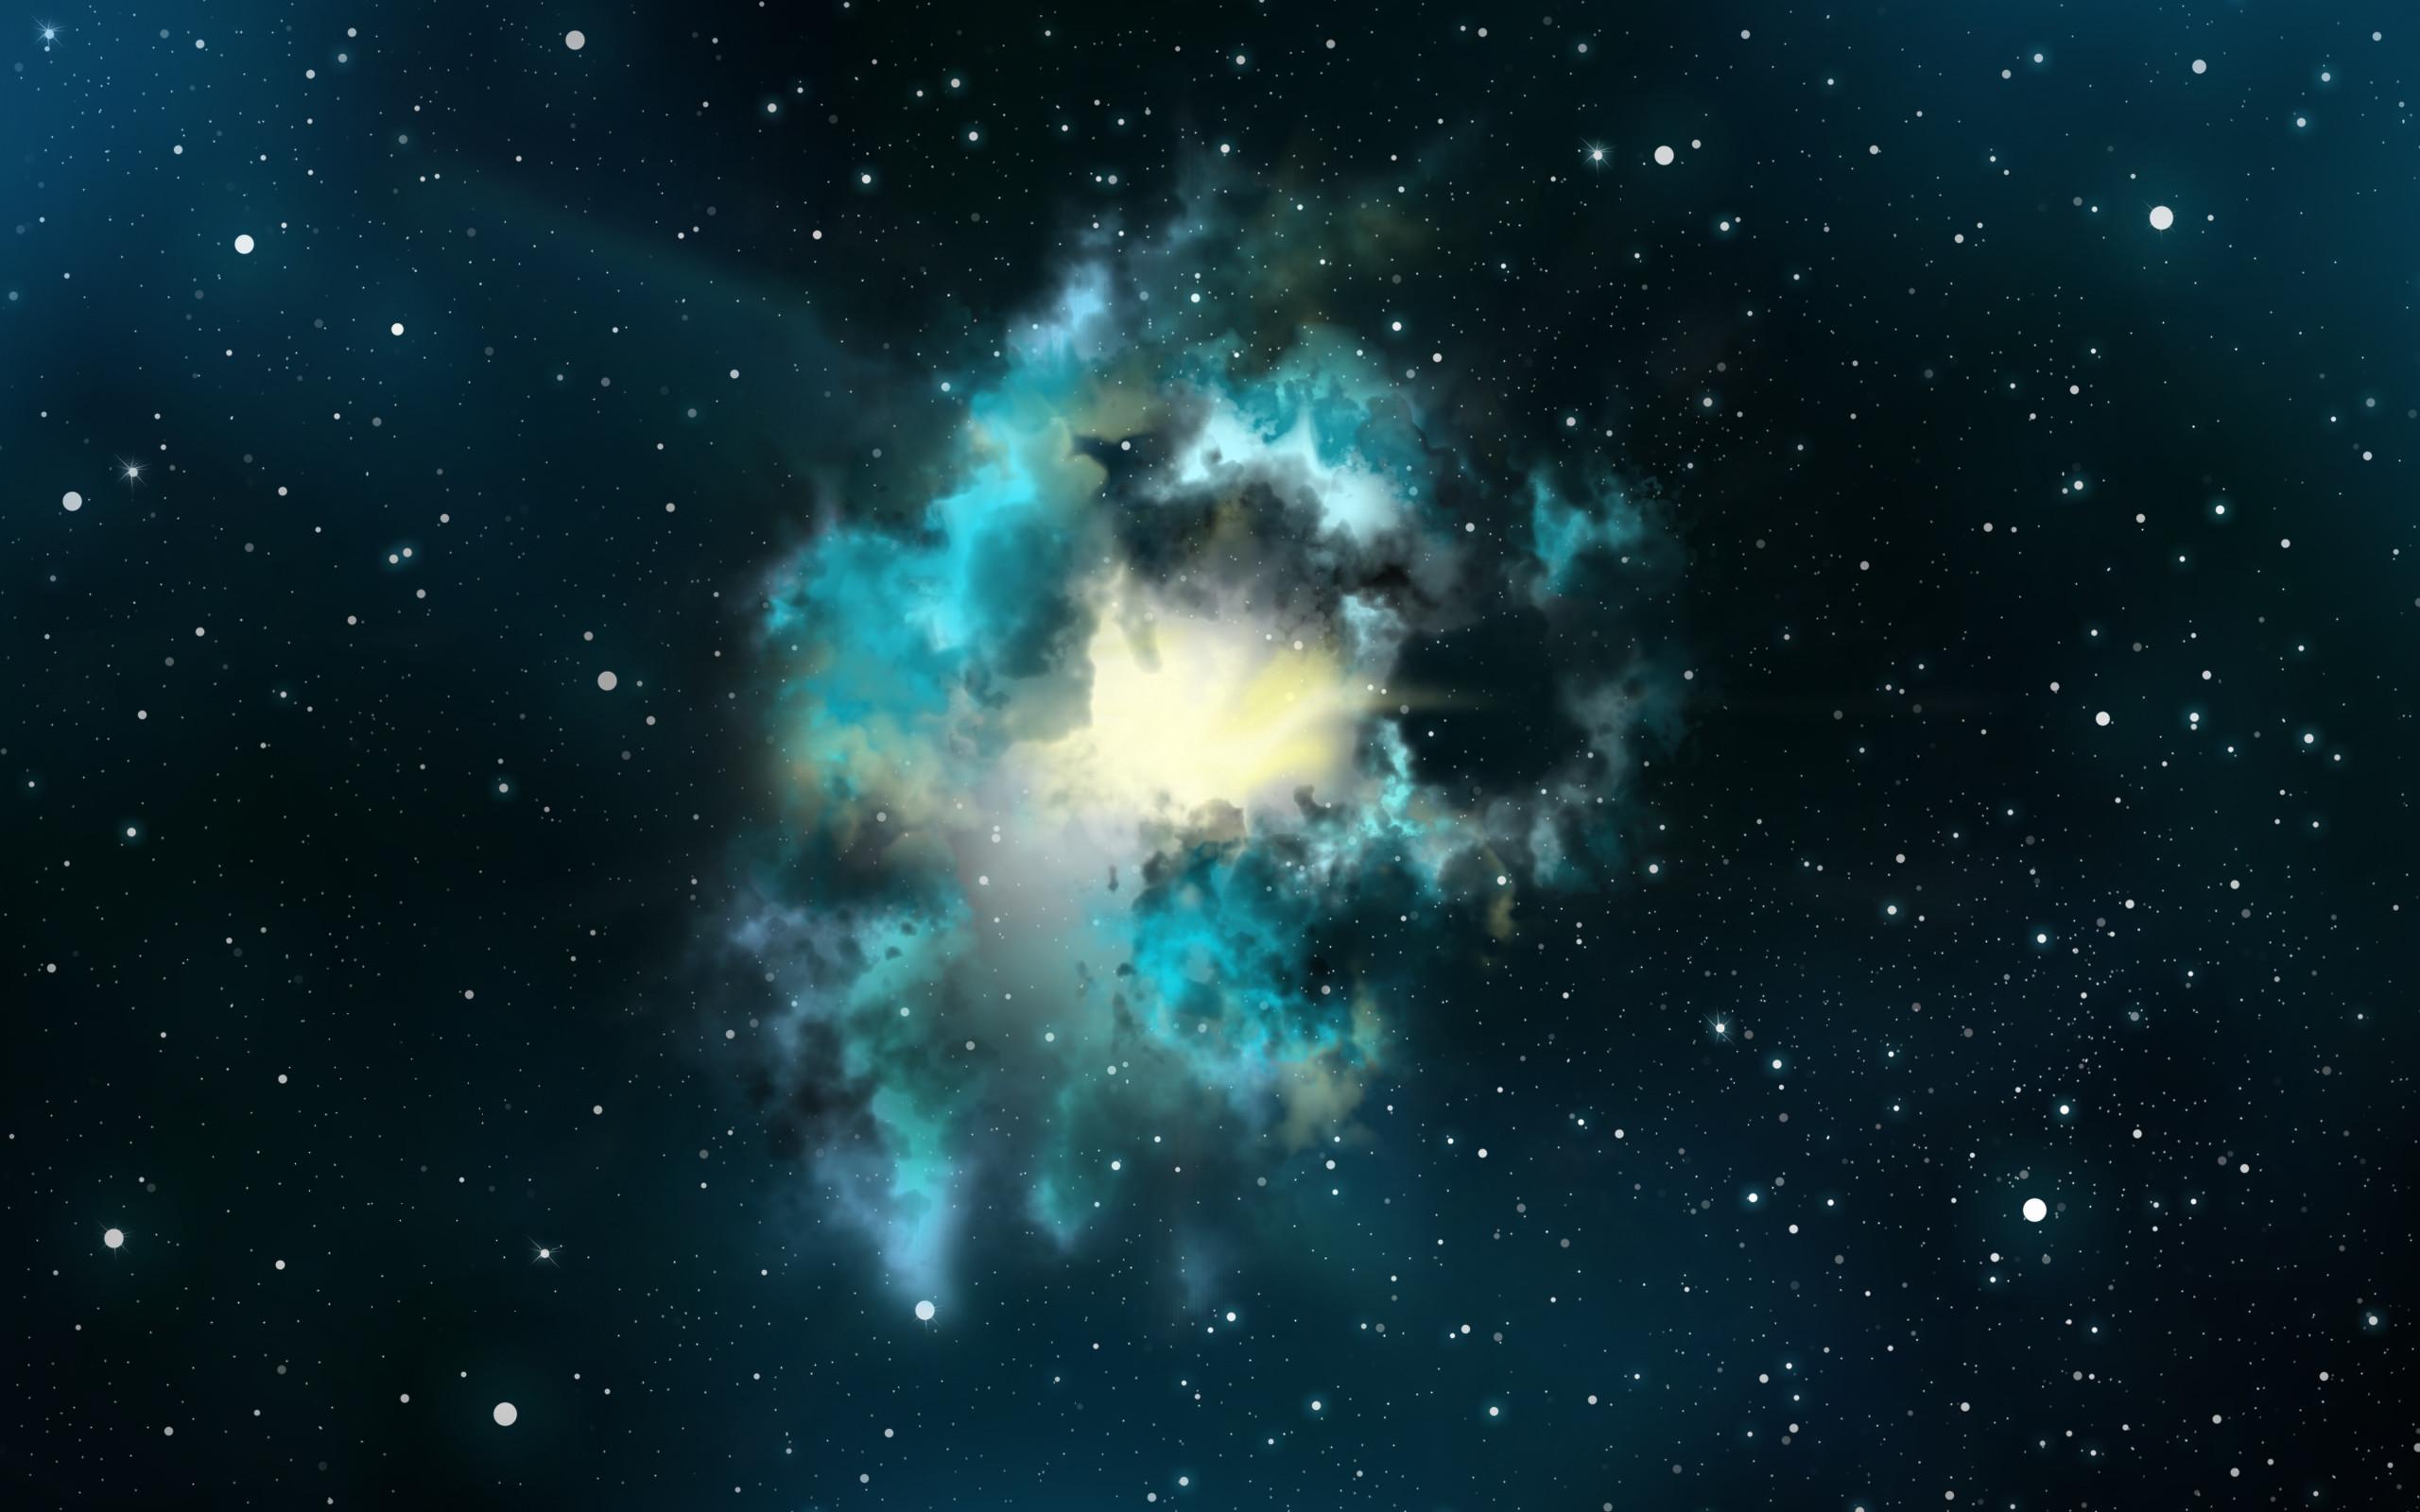 … nebula wallpaper hd 8420 1280×1024 px hdwallsource com …